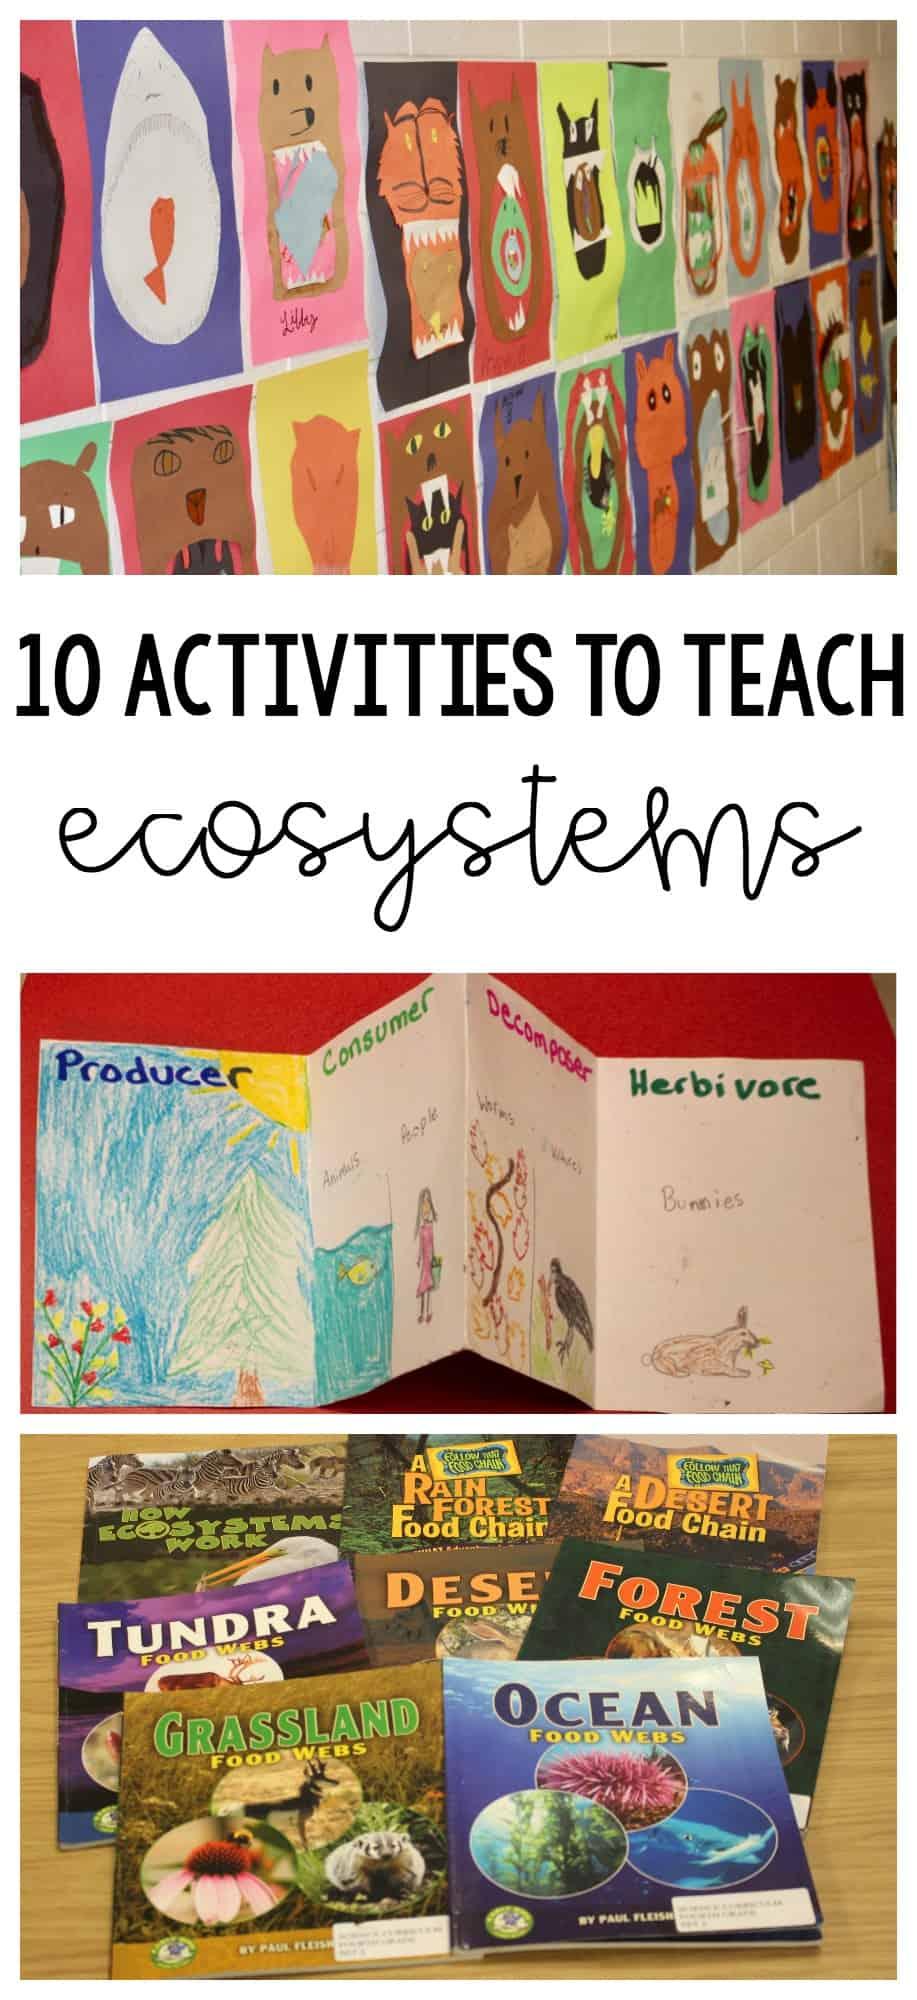 10 Activities To Teach Ecosystems Ashleighs Education Journey